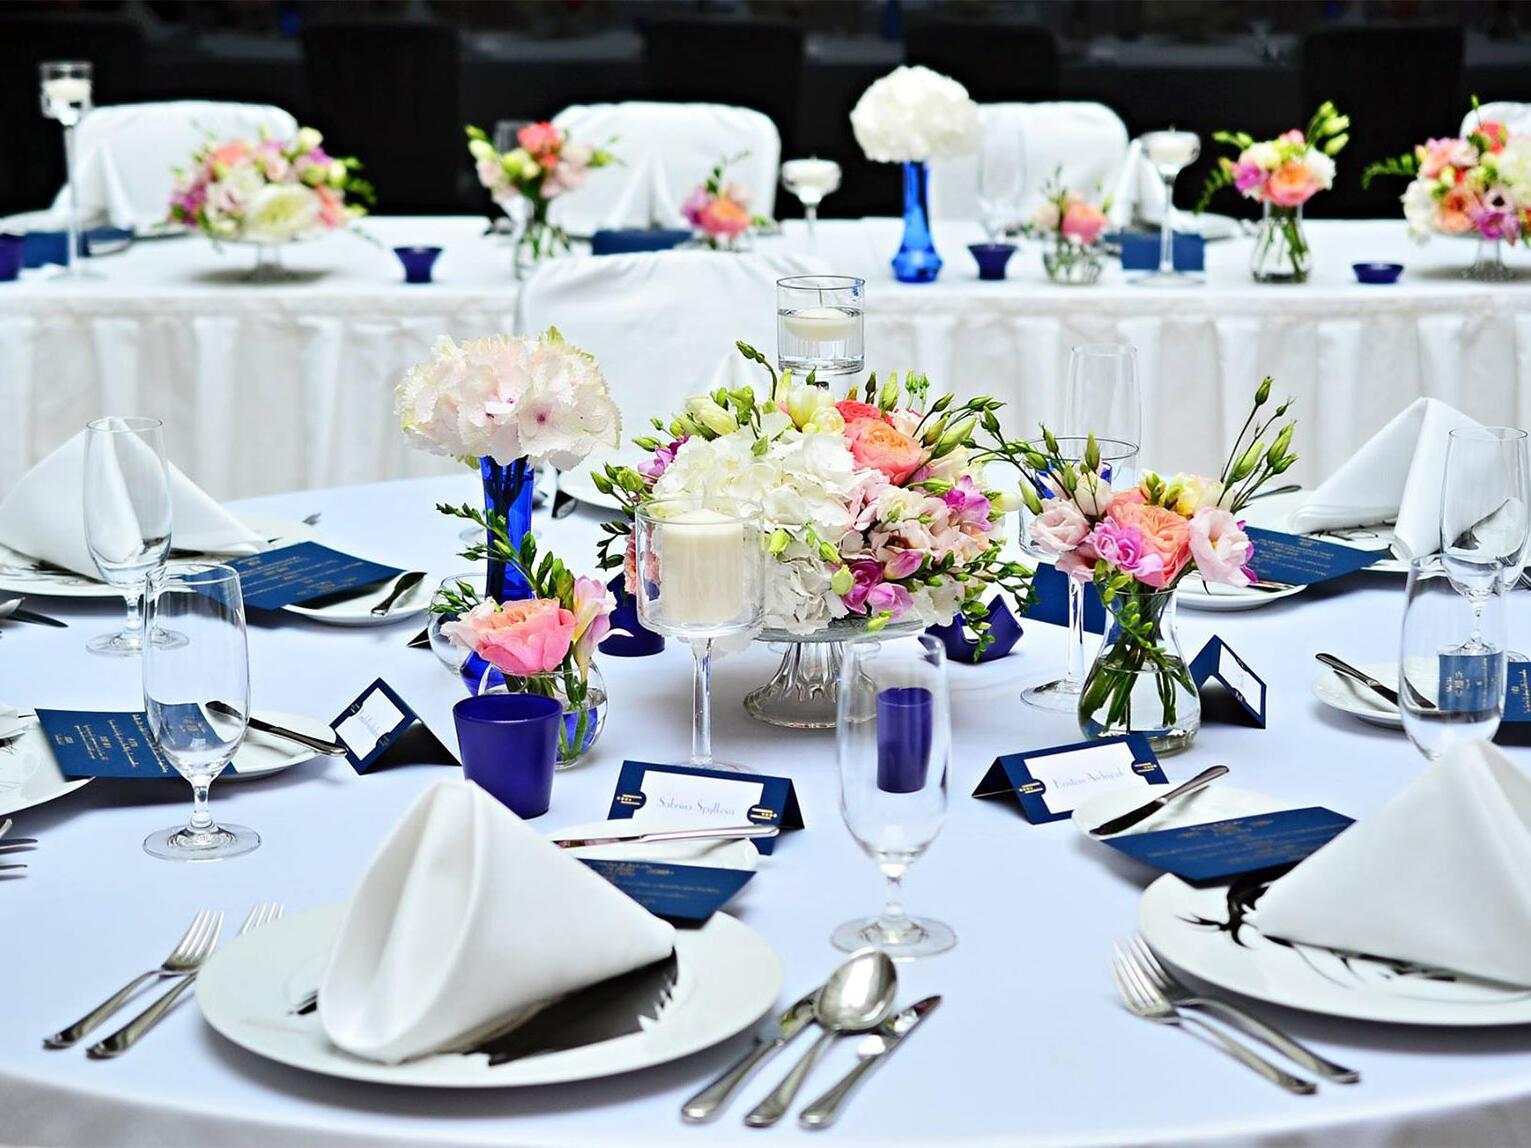 Diamond Wedding Reception Package at Aria Hotel in Prague